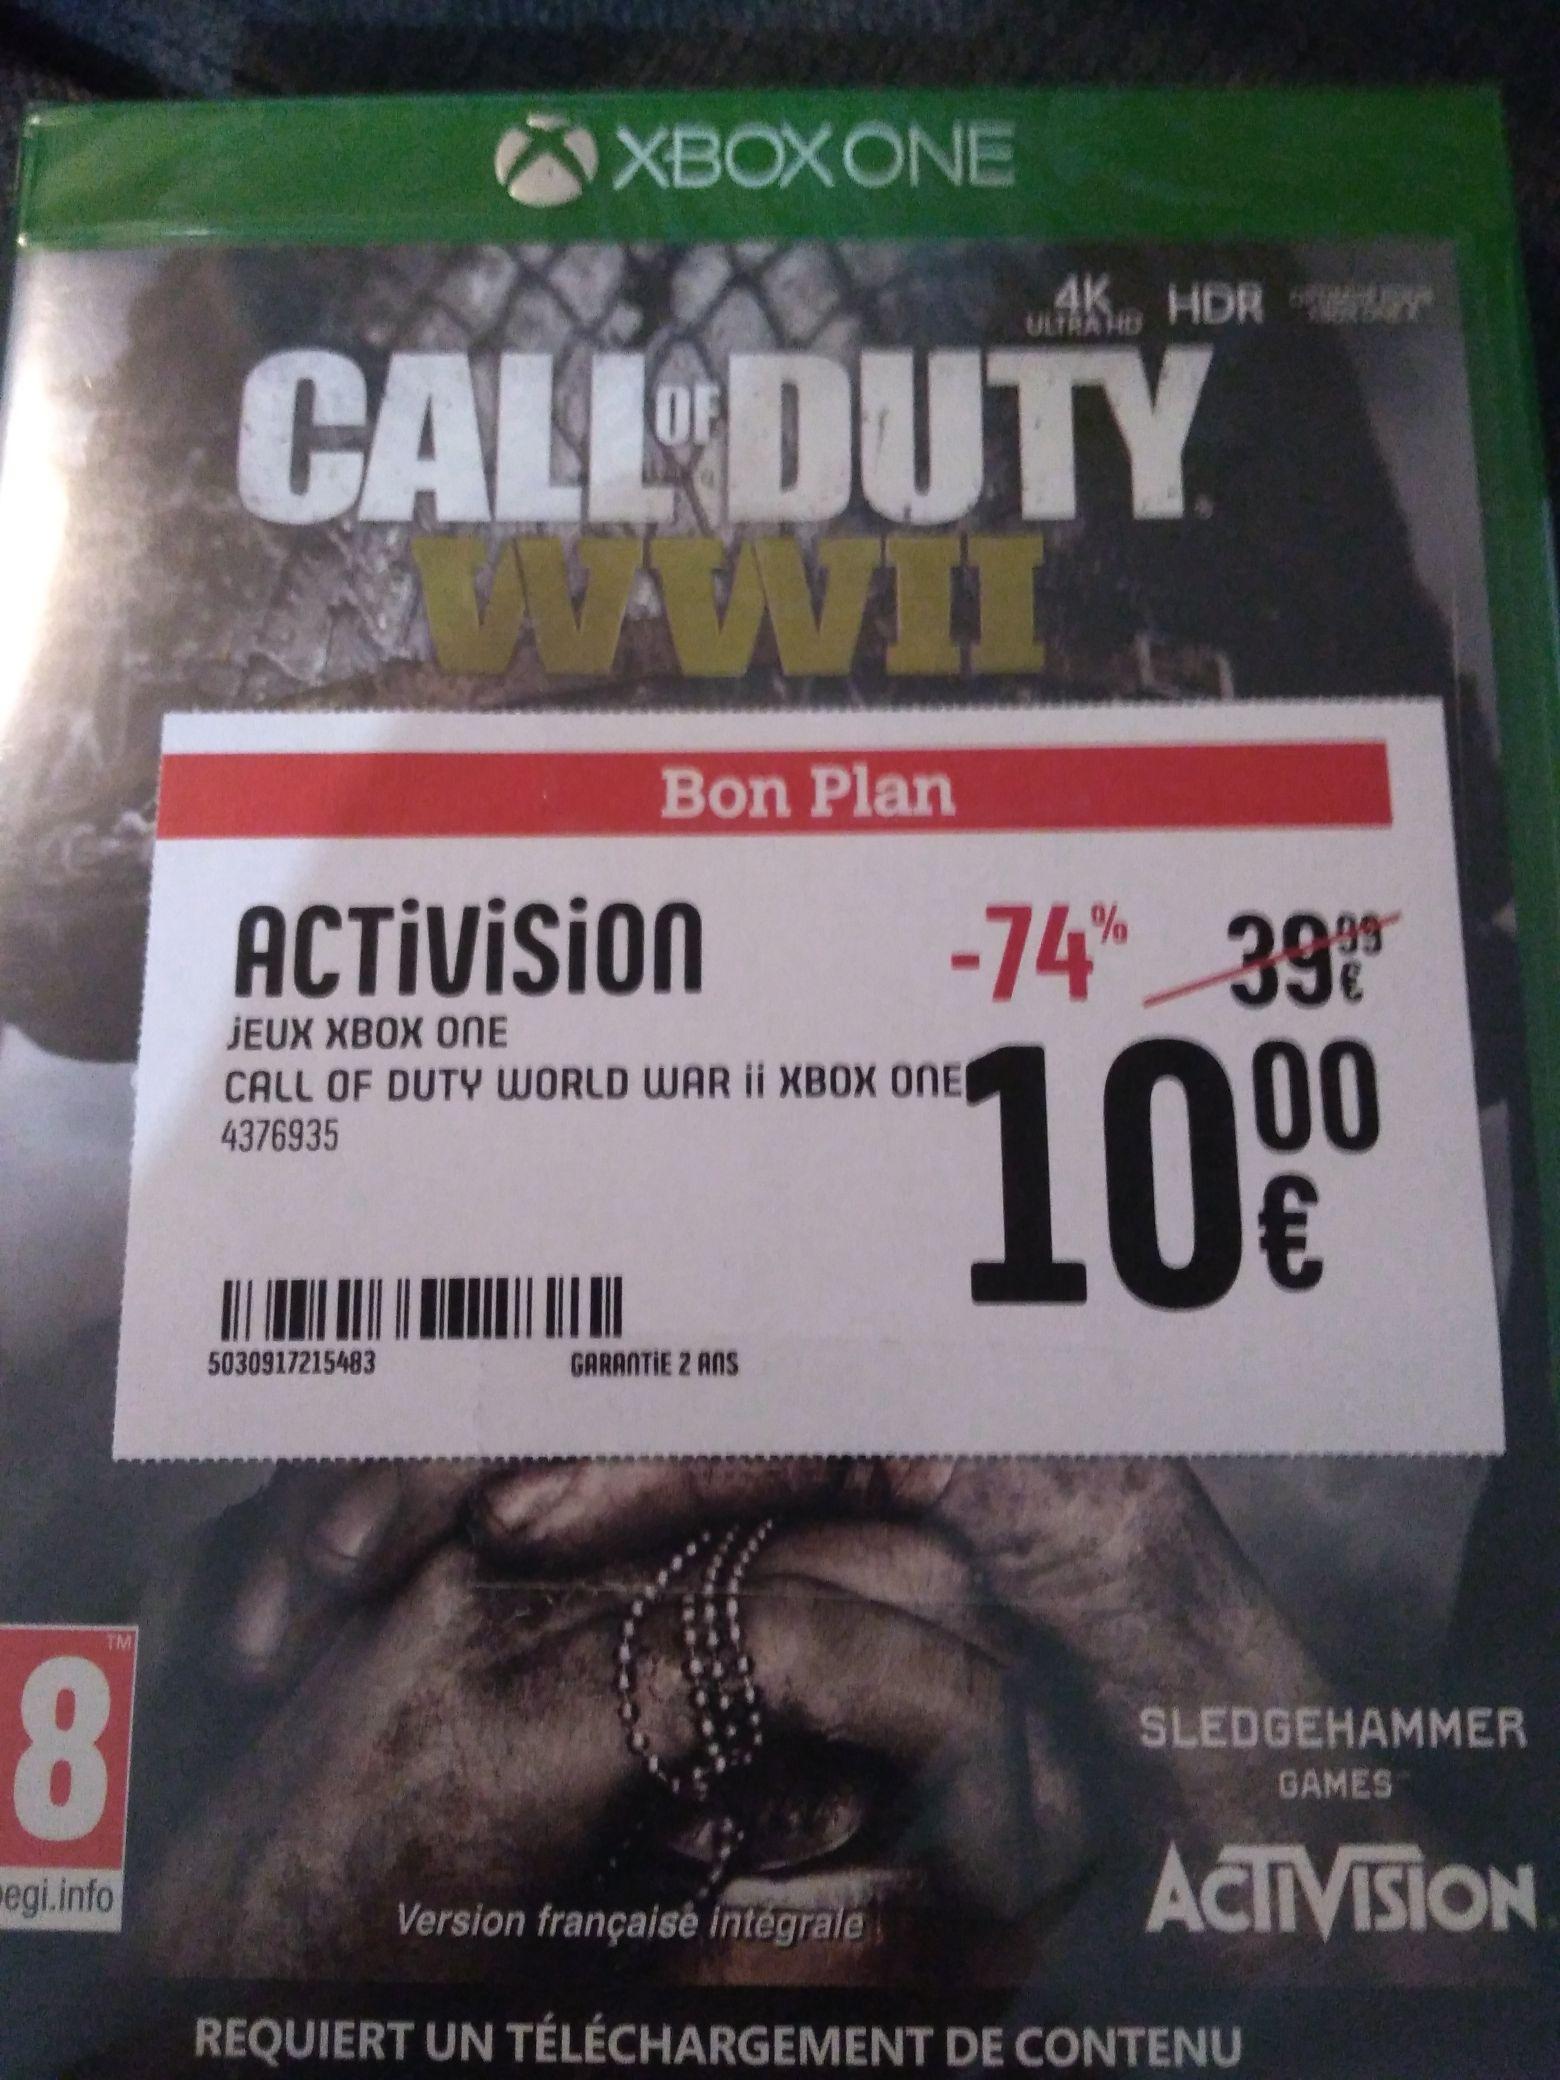 Jeu Call of Duty WWII sur Xbox One - Darty de Chanteloup-en-Brie (77)